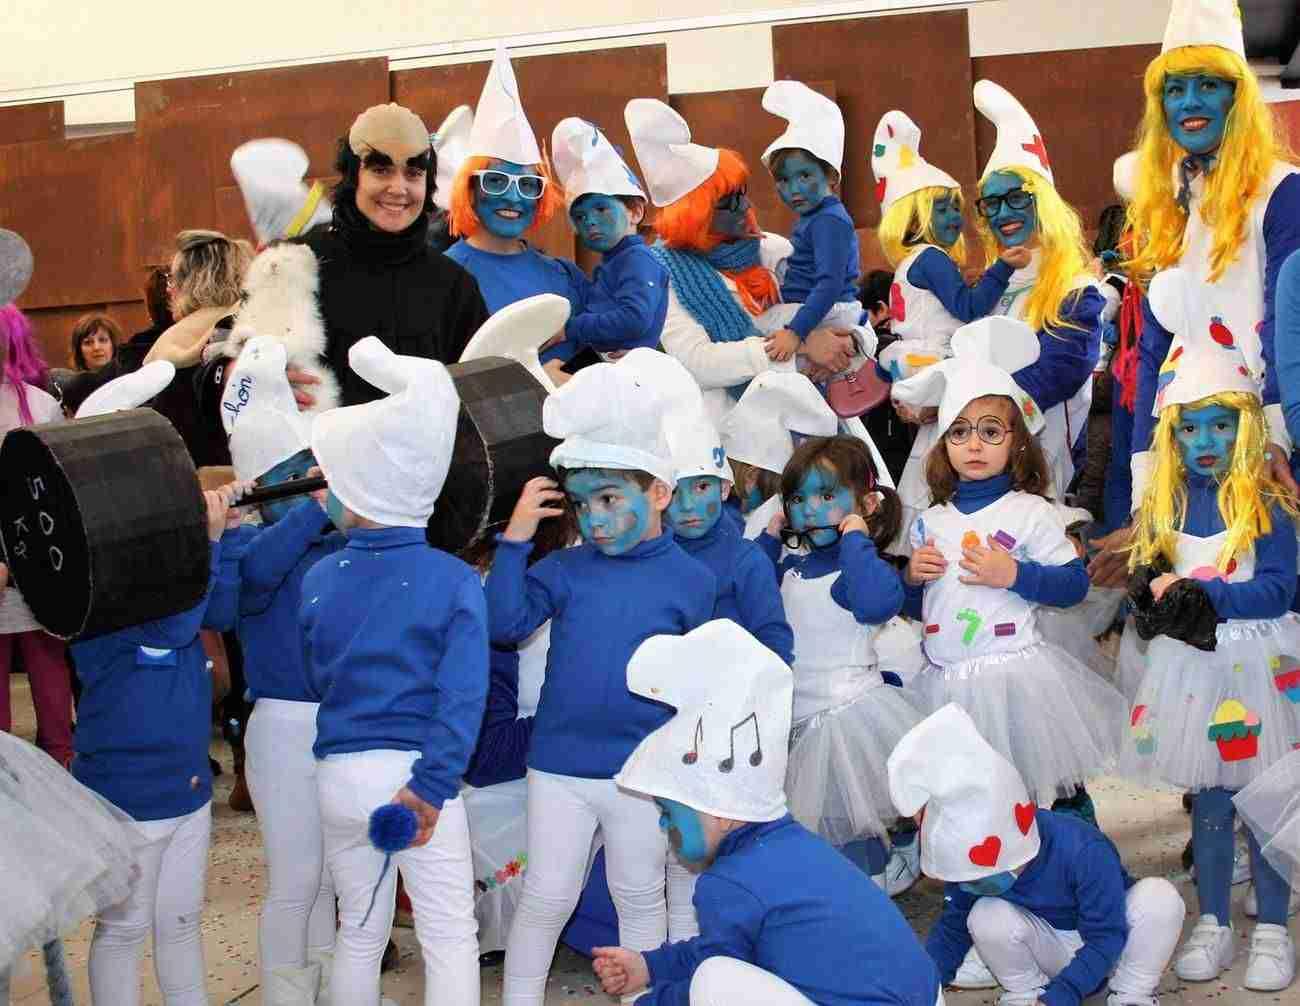 carnaval-cole-torralba-pitufos 1